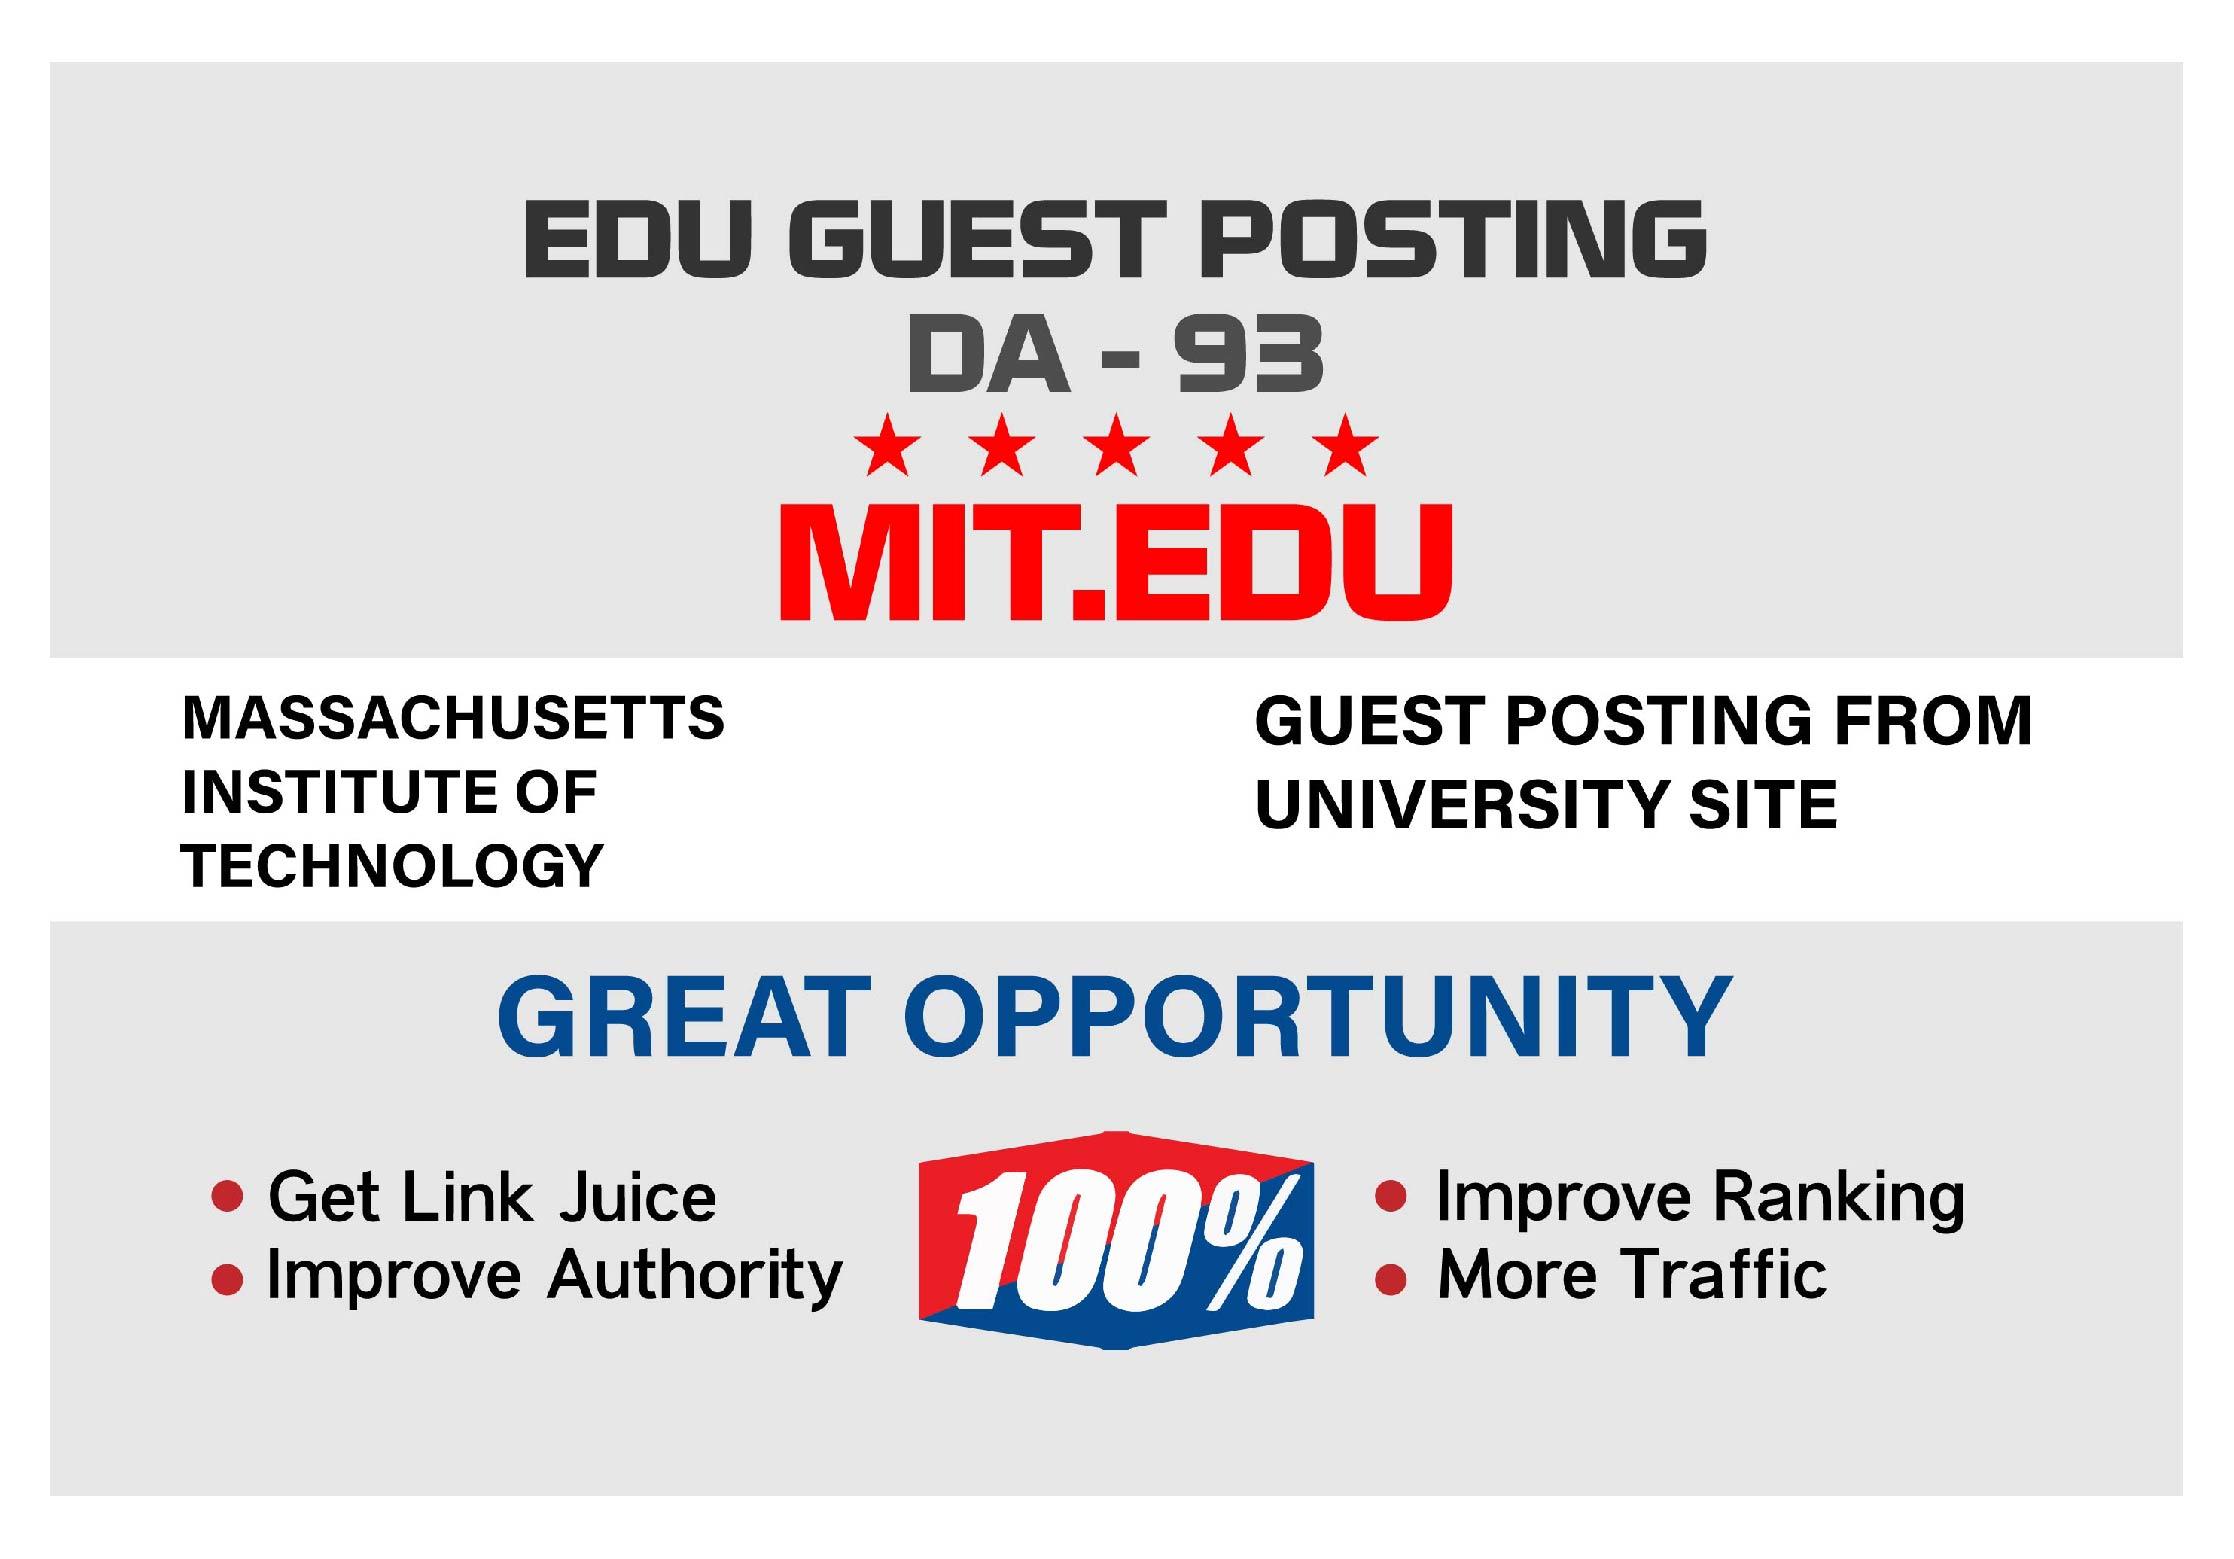 I wil publish MIT edu DA 93 High Quality guest post